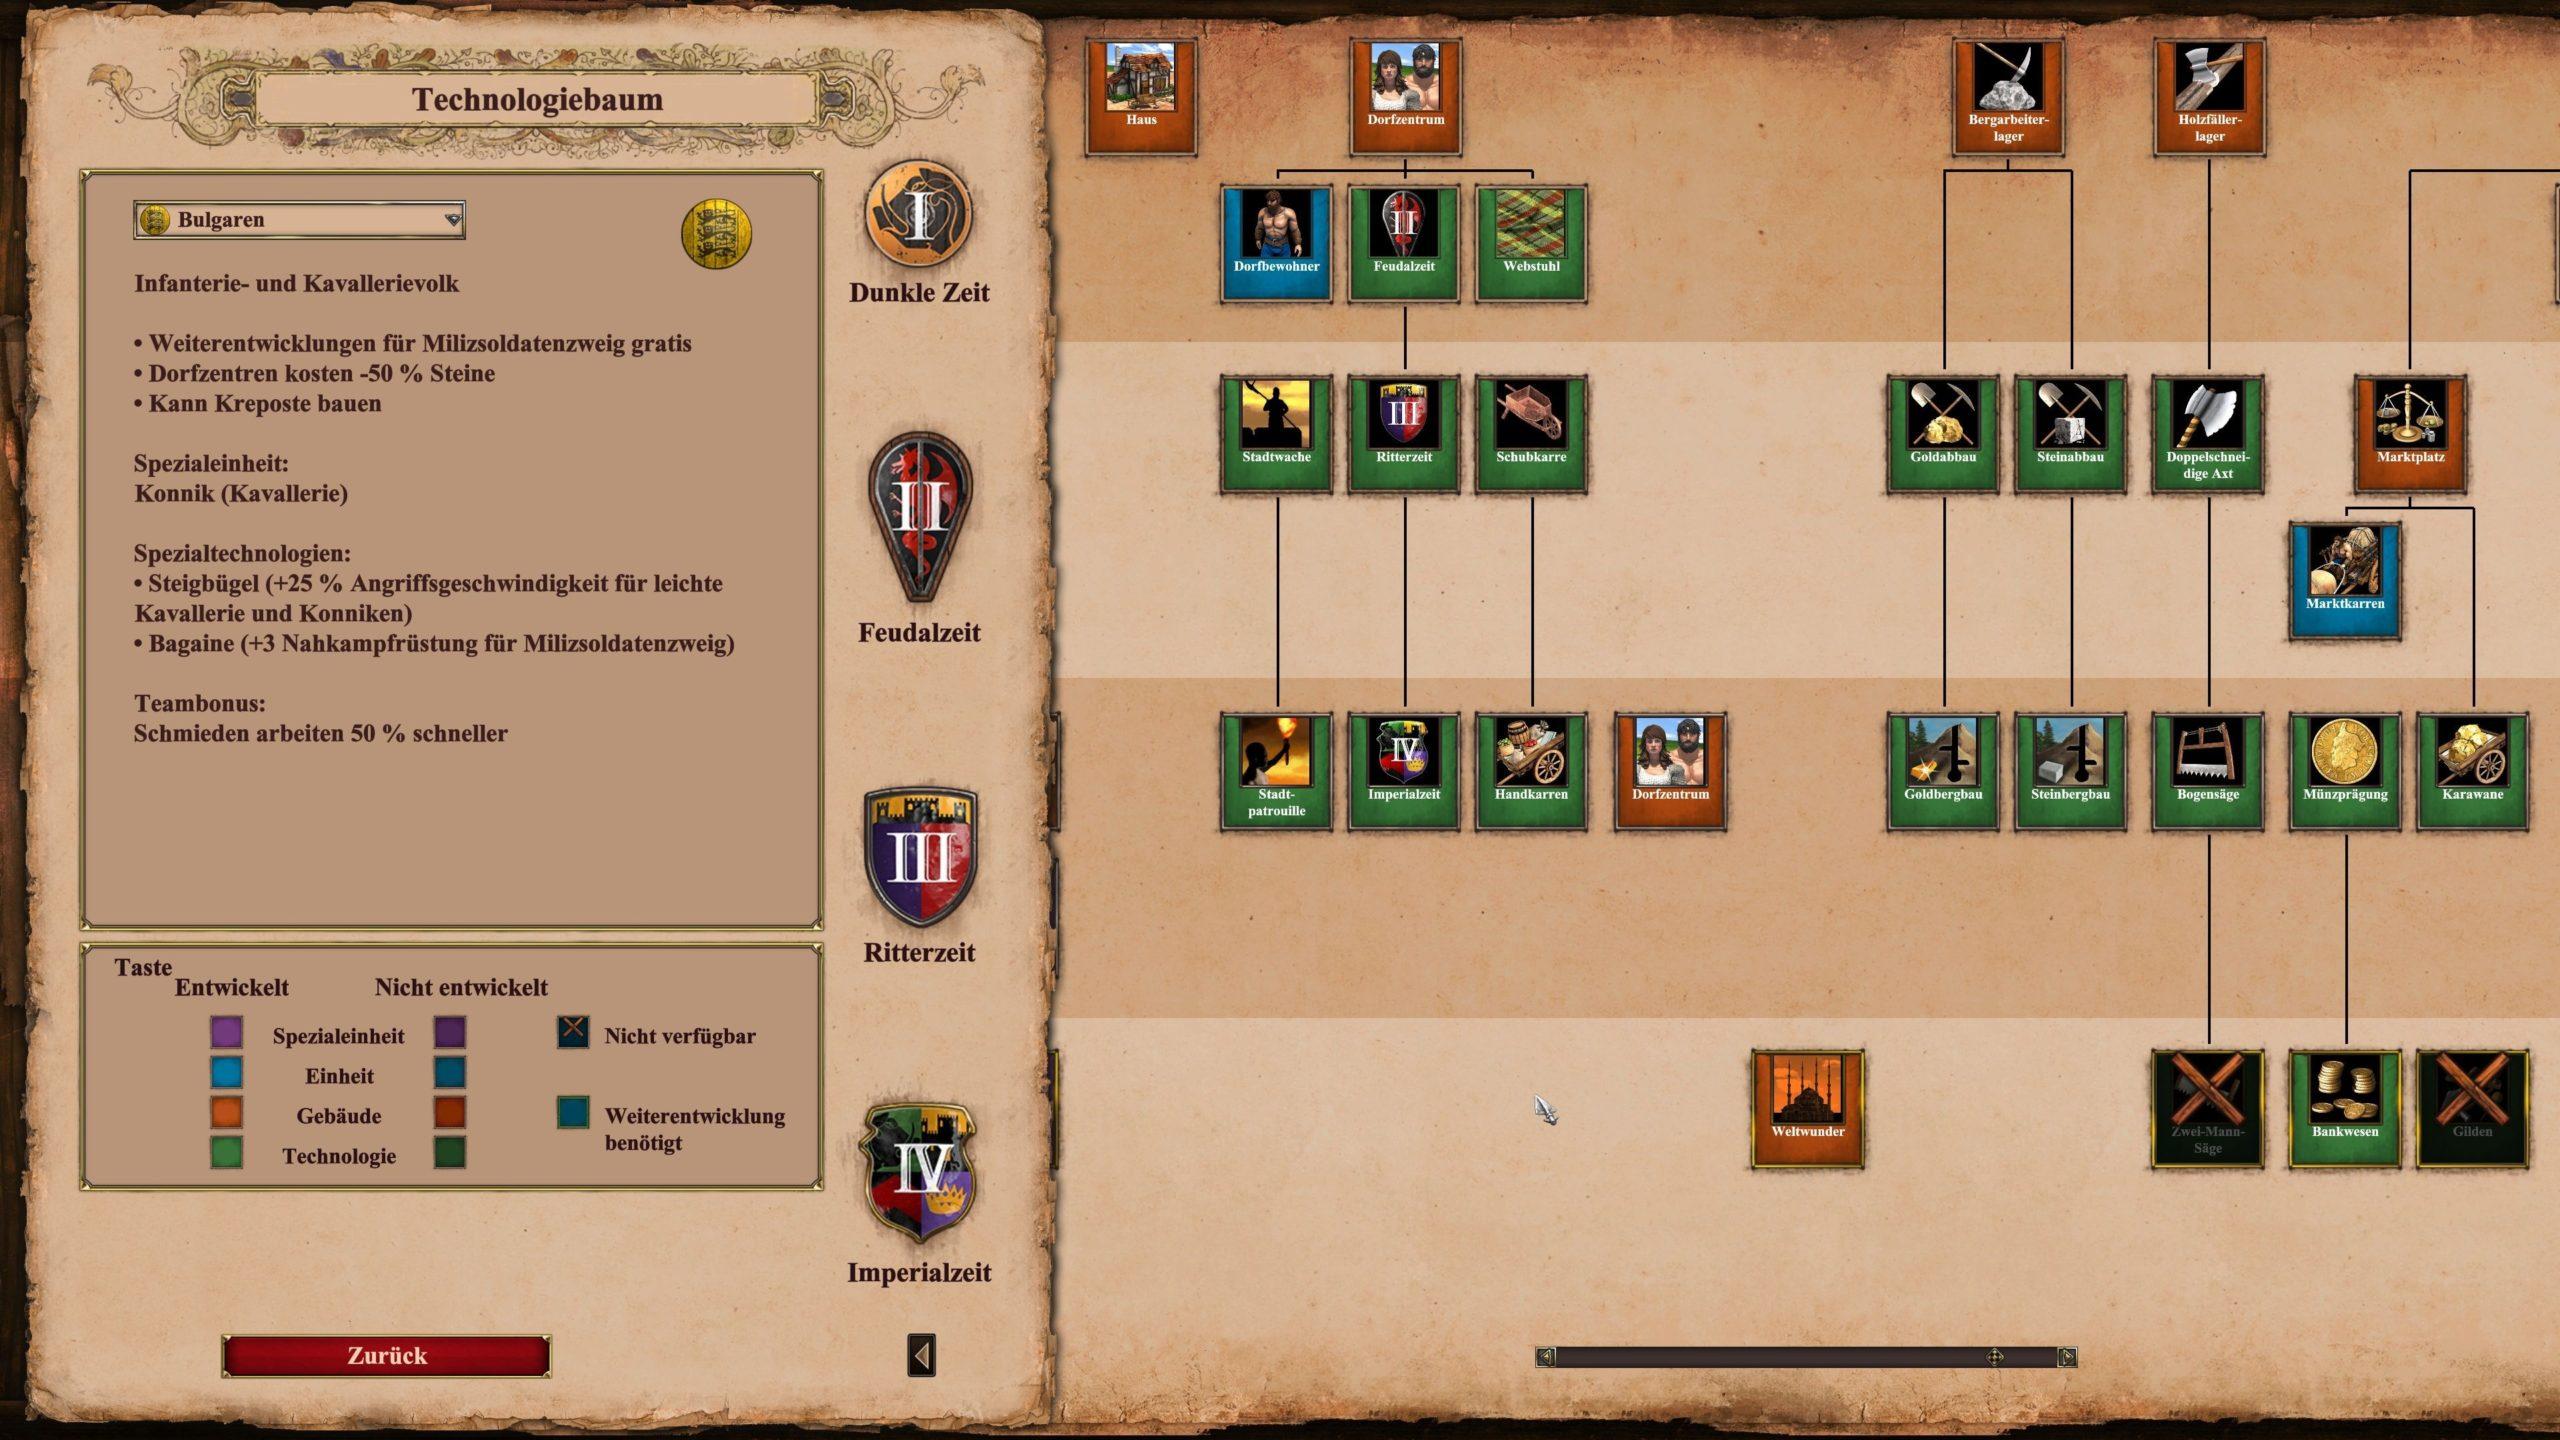 Age of Empires II, Technologiebaum